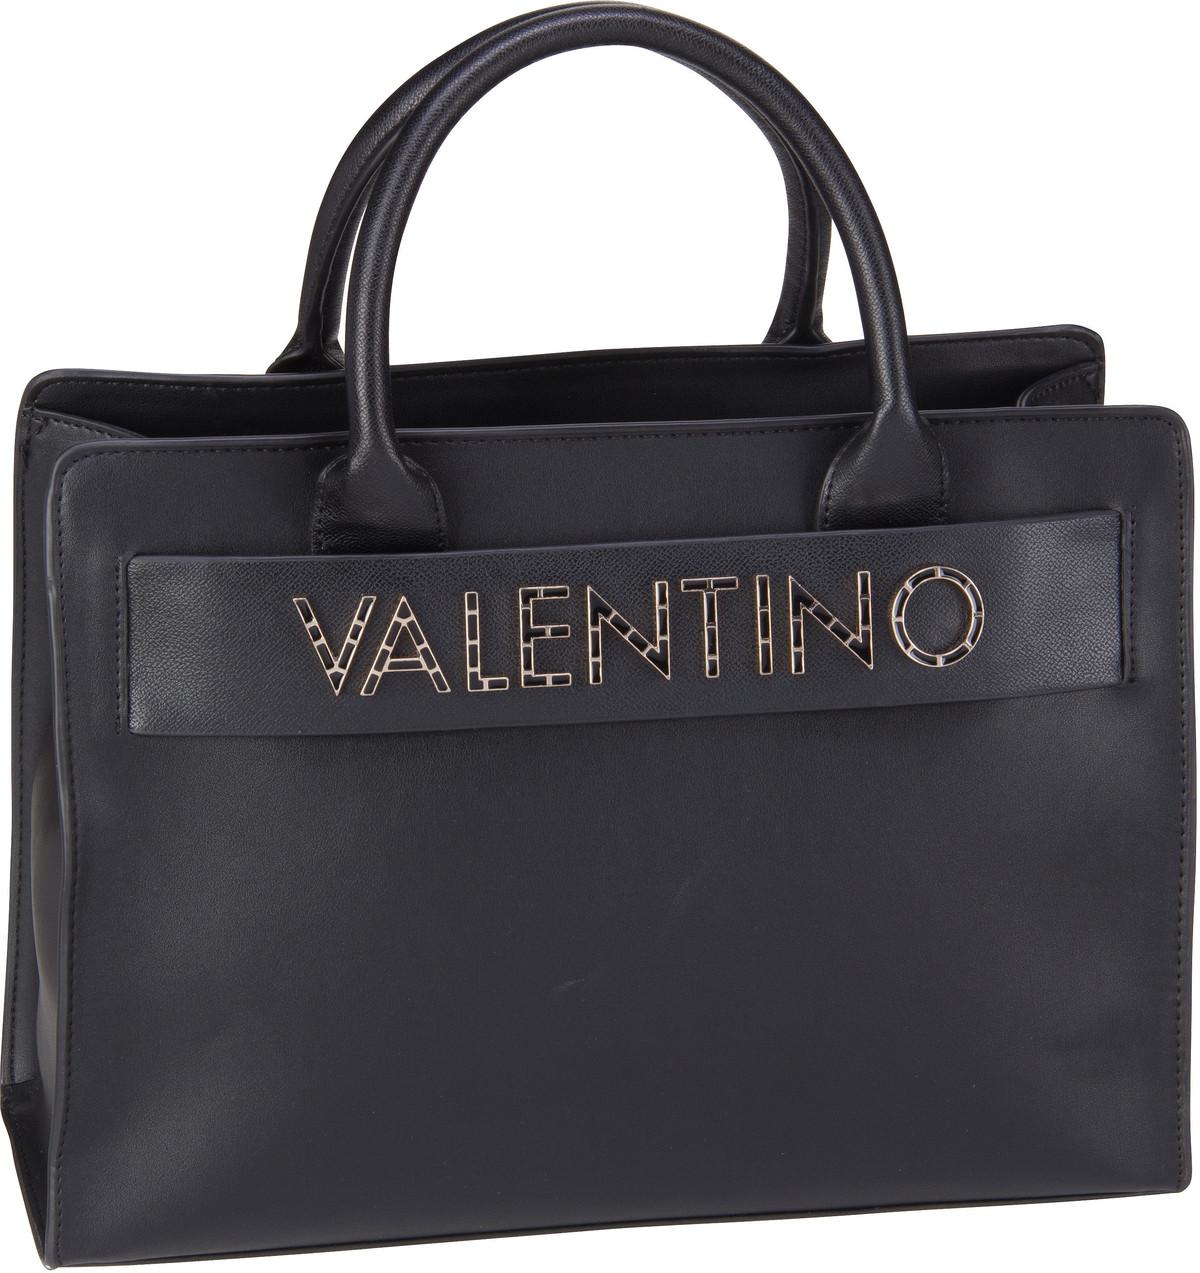 Handtasche Fisarmonica Shopping X05 Nero